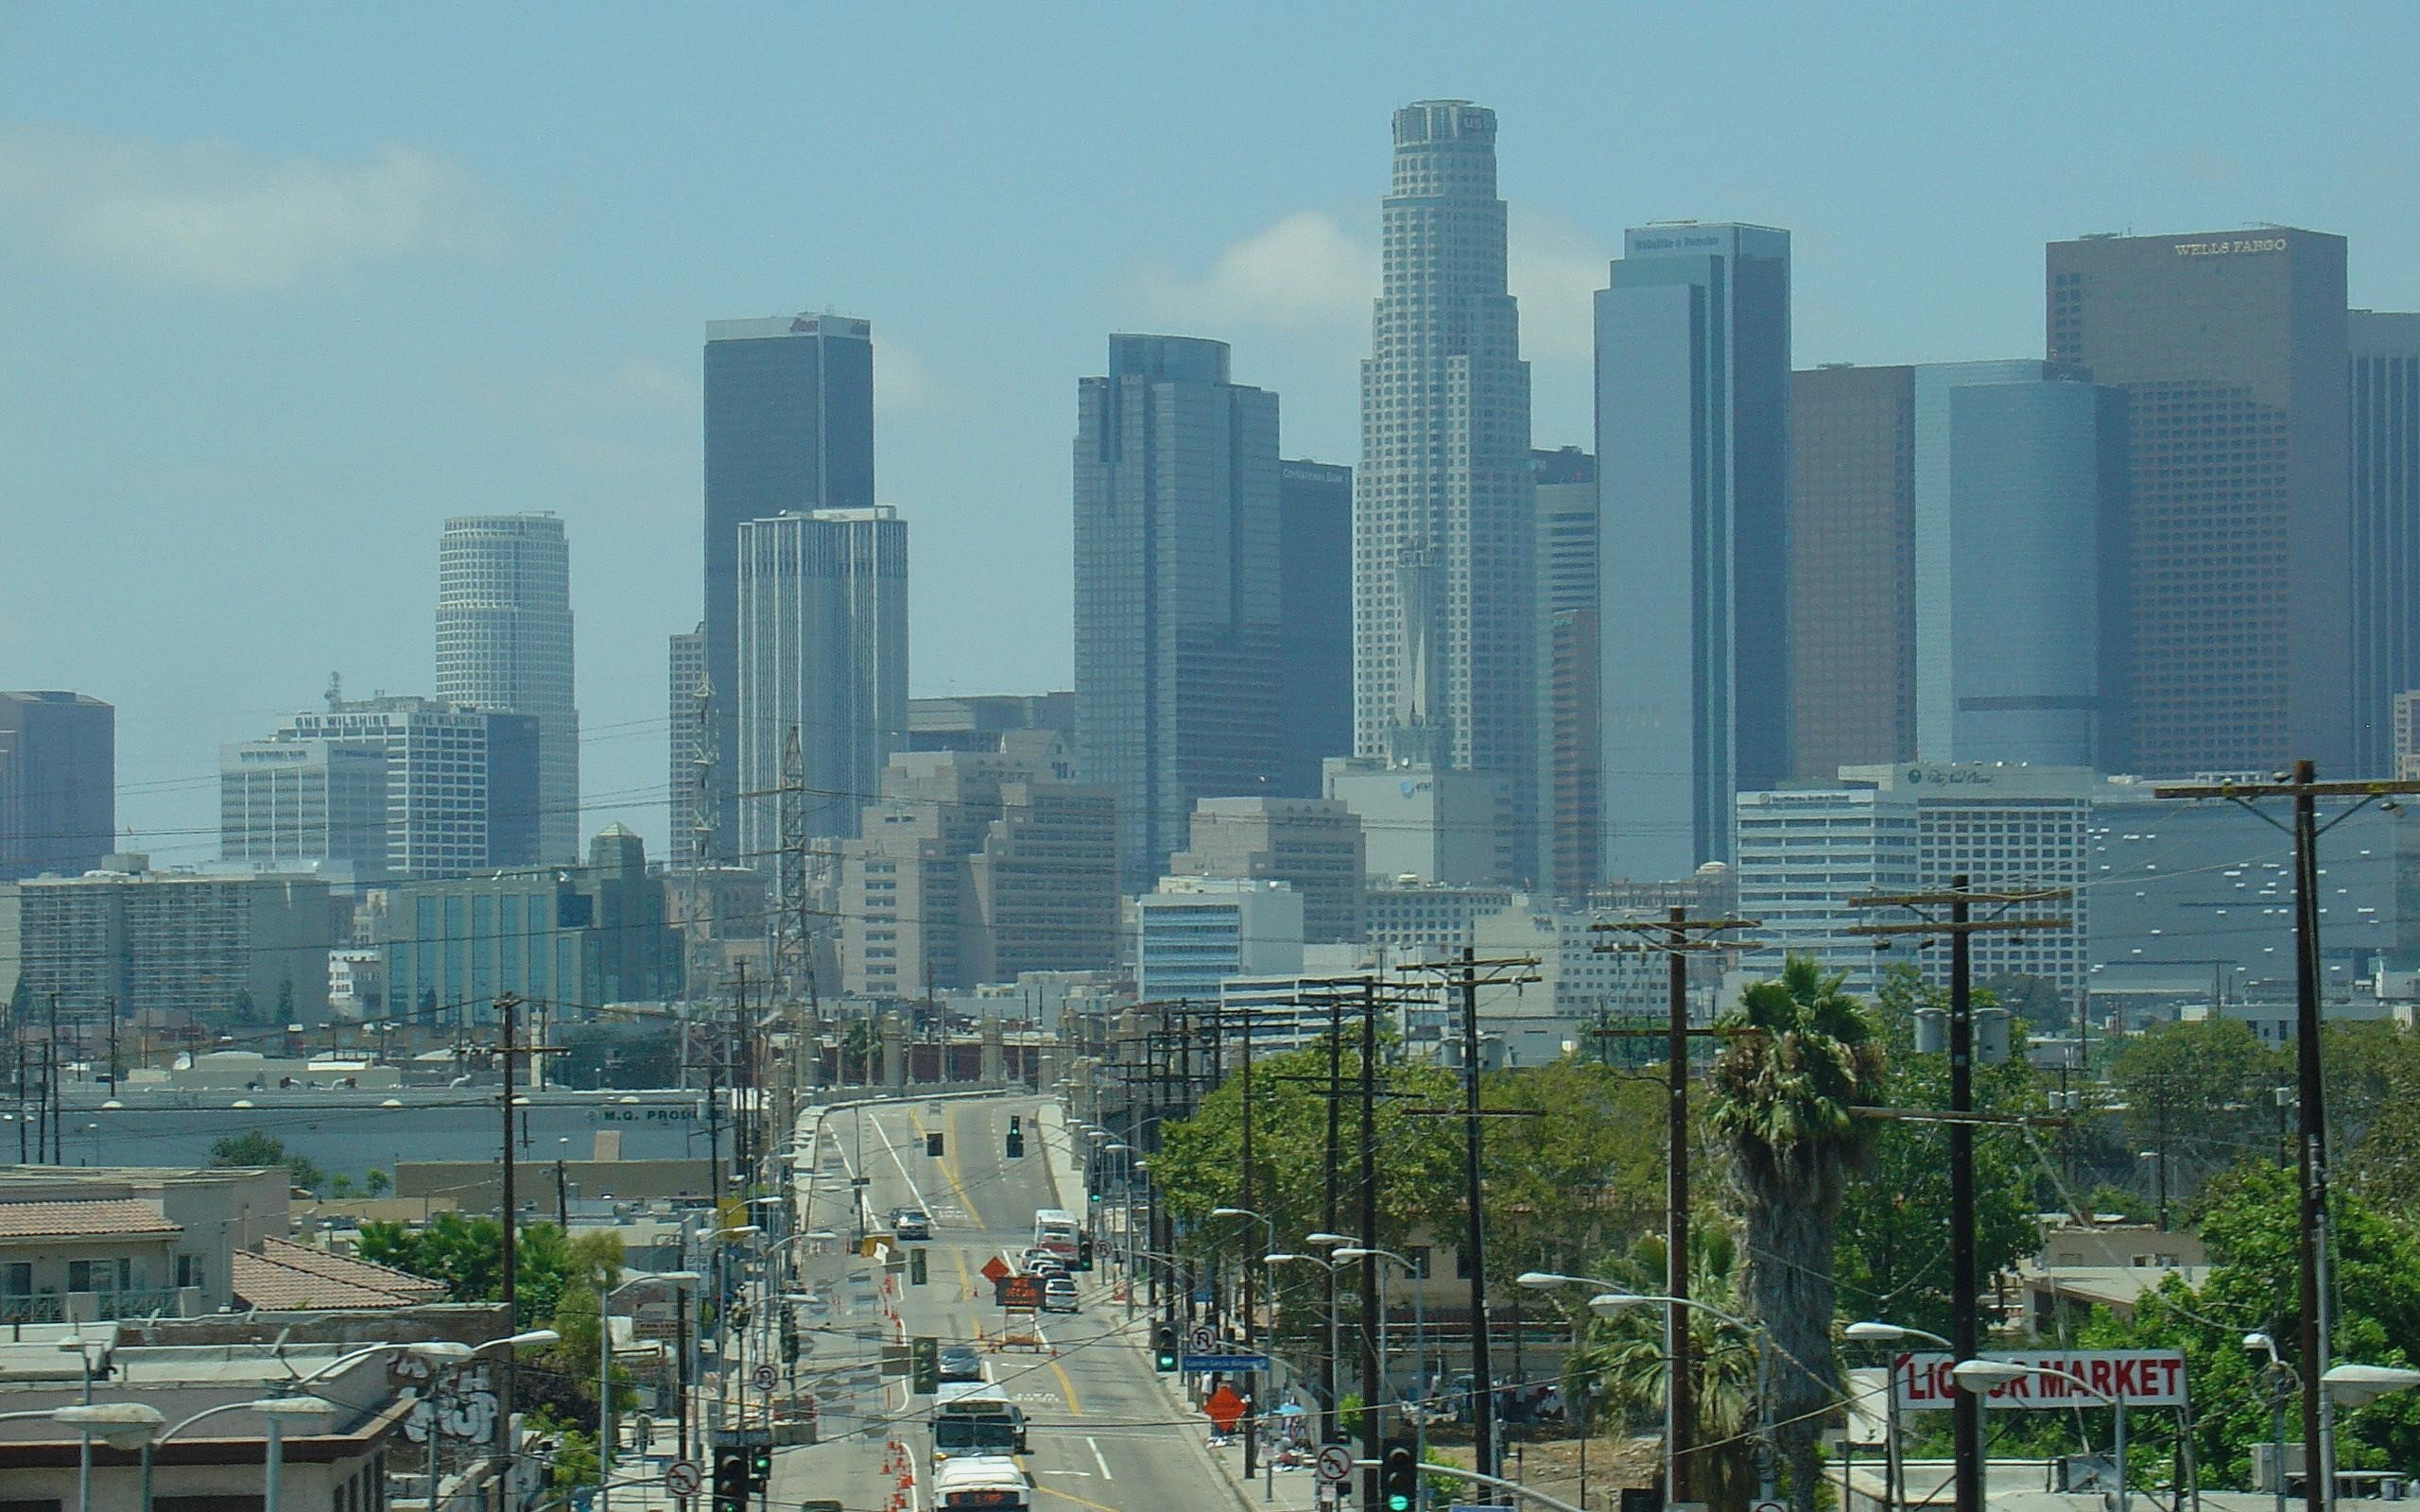 Los Angeles new photos